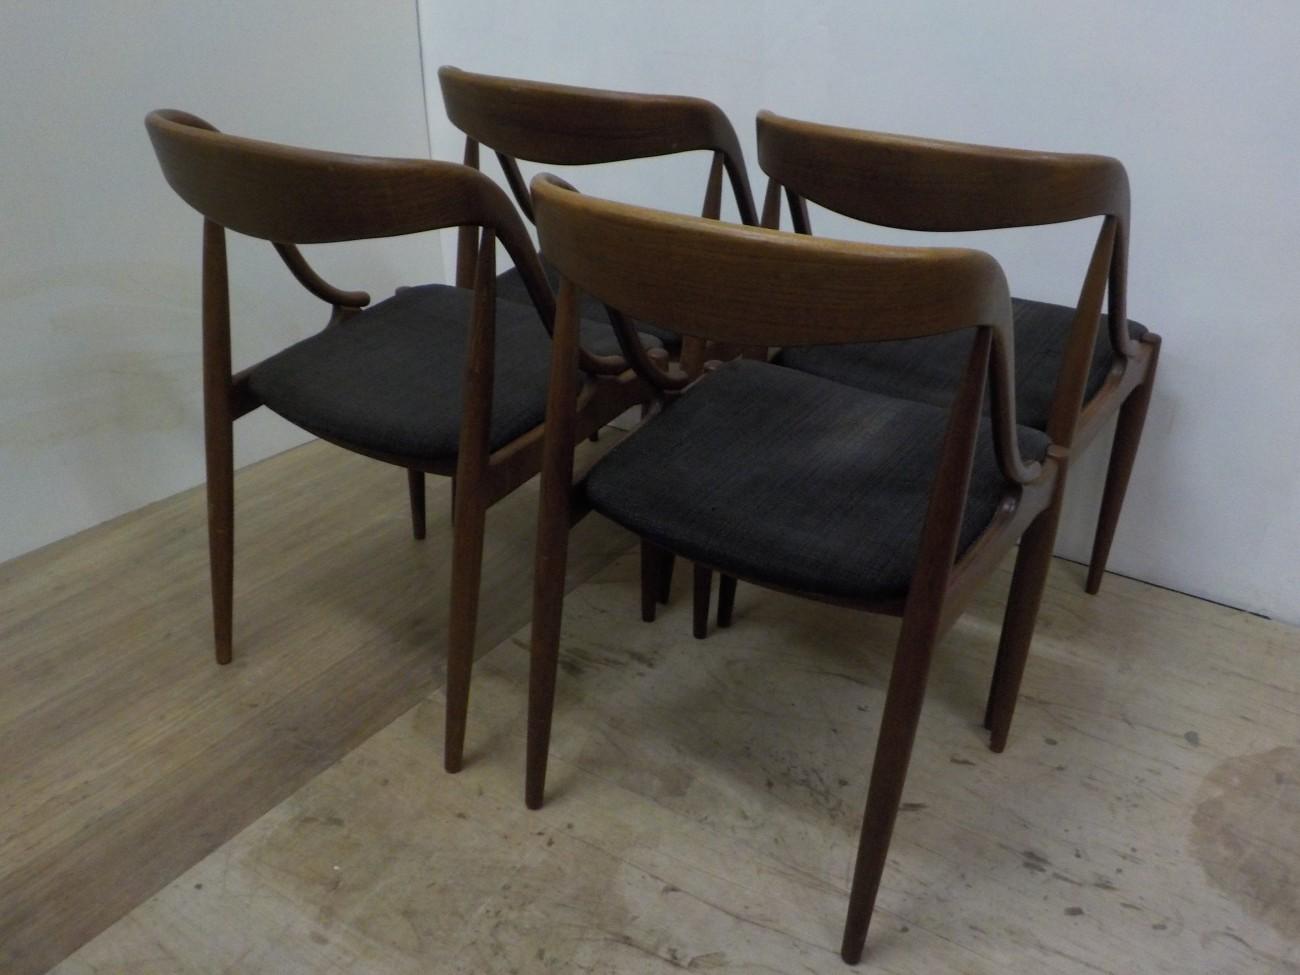 Johannes Andersen Dining Chair / チーク ヨハネス・アンダーセン ダイニングチェア / stock2012-23